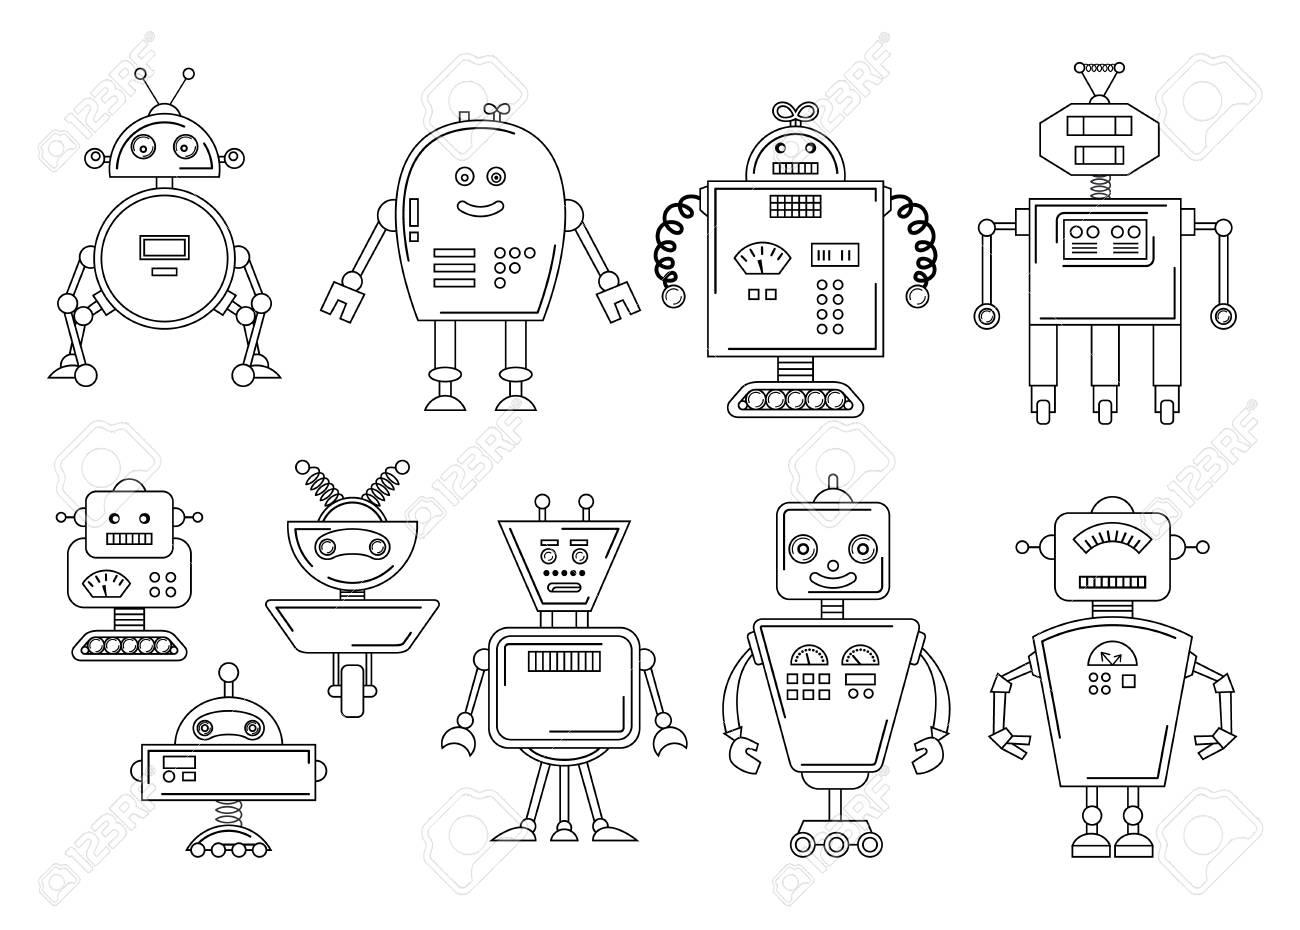 Vector Illustration Of A Robot. Mechanical Character Design ...